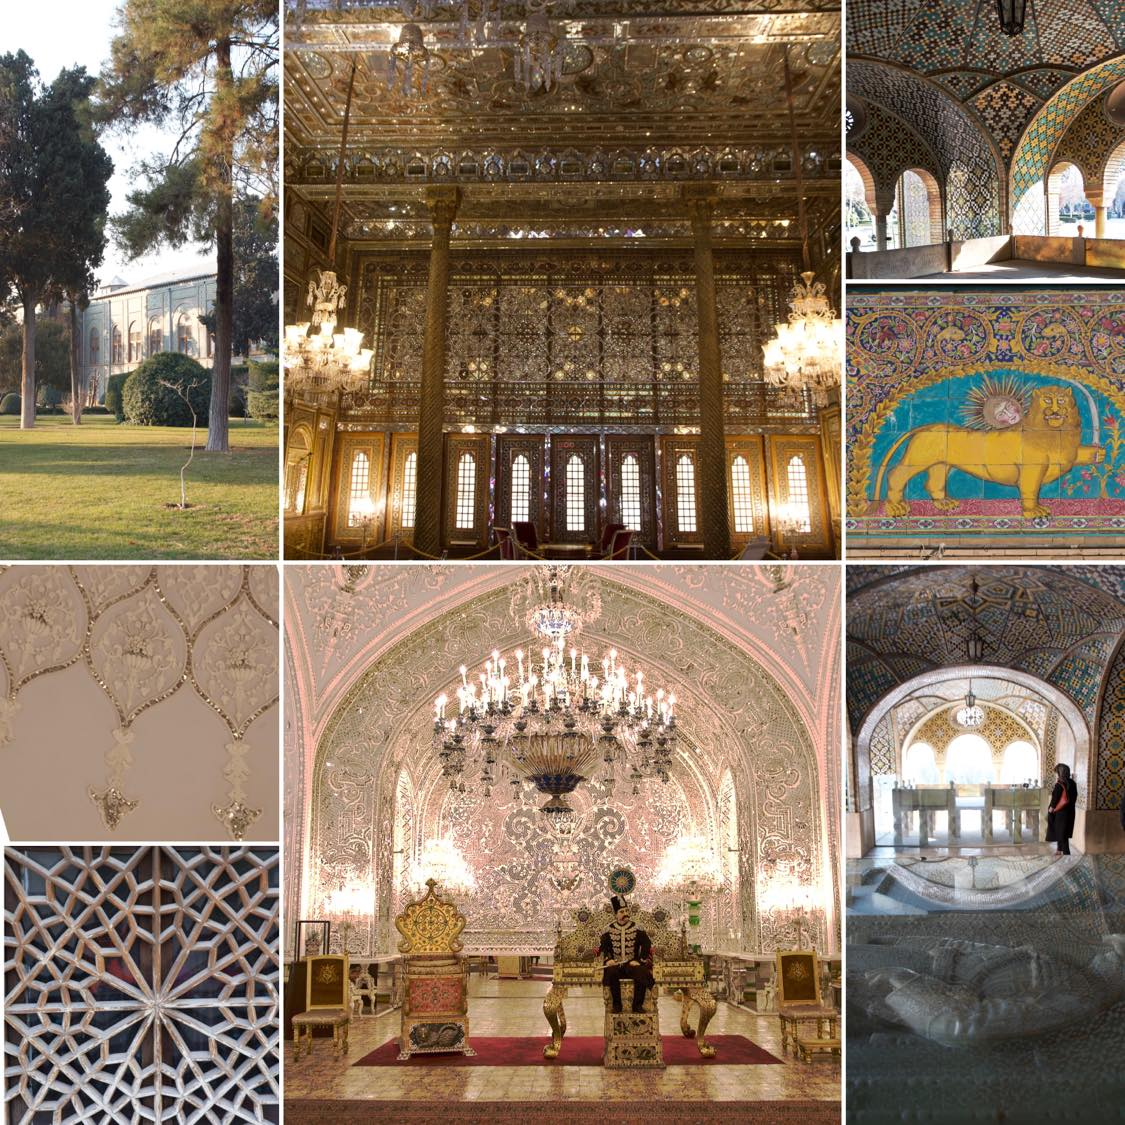 GOLESTAN PALAST, Tehran, Reisebericht, Collage Tehran, Teheran